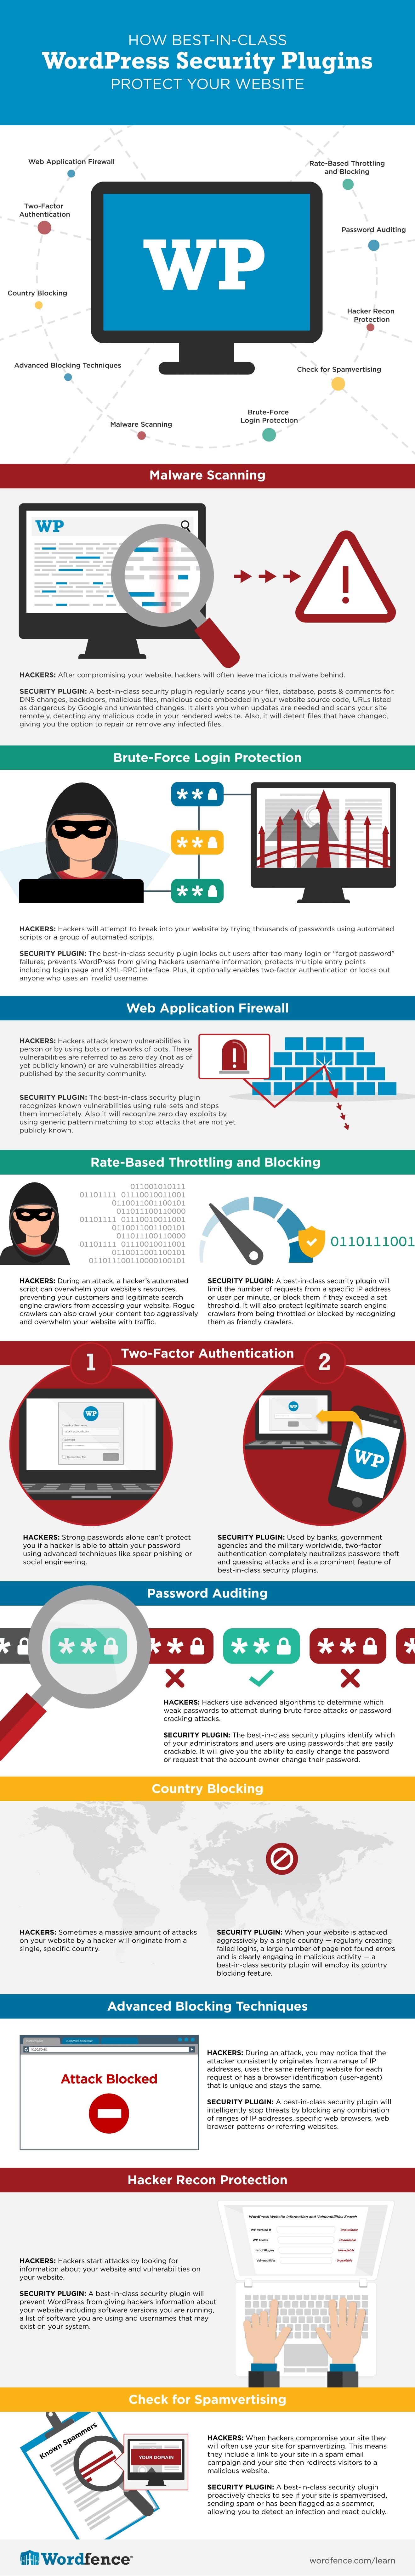 How-Best-In-Class-WordPress_Security-Plugins-Protect-Your-Website